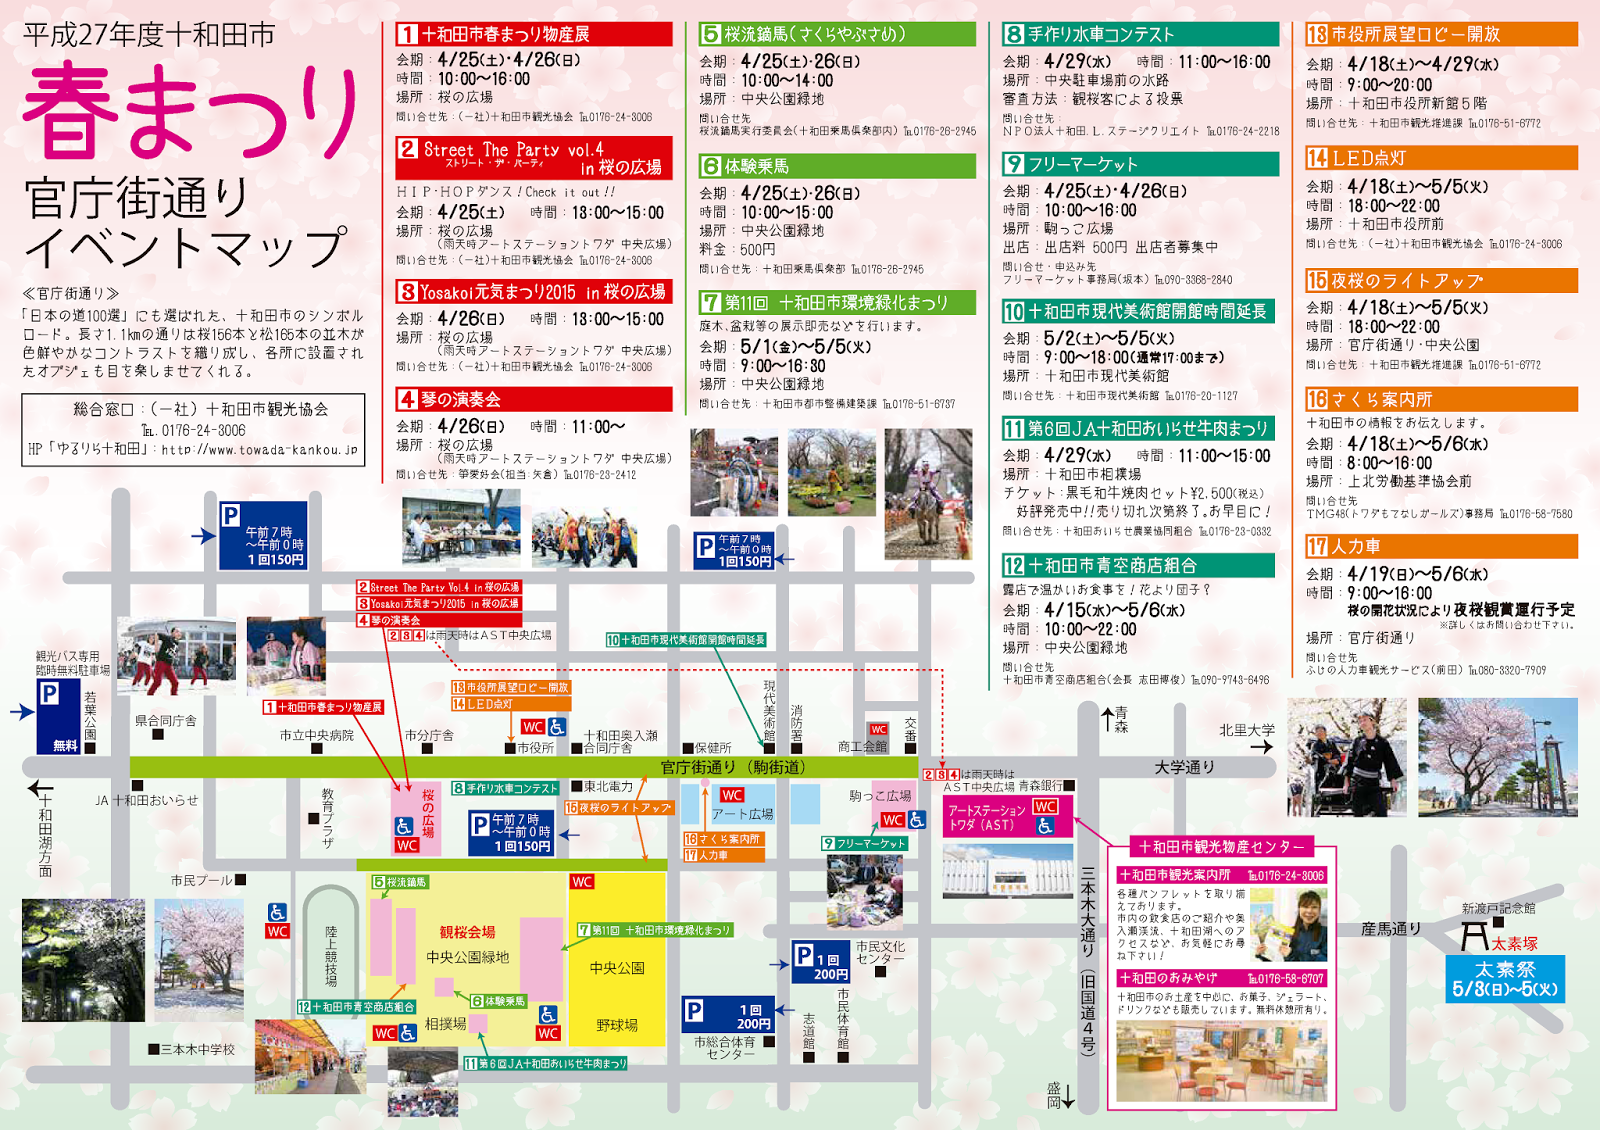 2015 Towada Haru Matsuri Spring Festival Flyer H27年十和田市春まつり チラシ